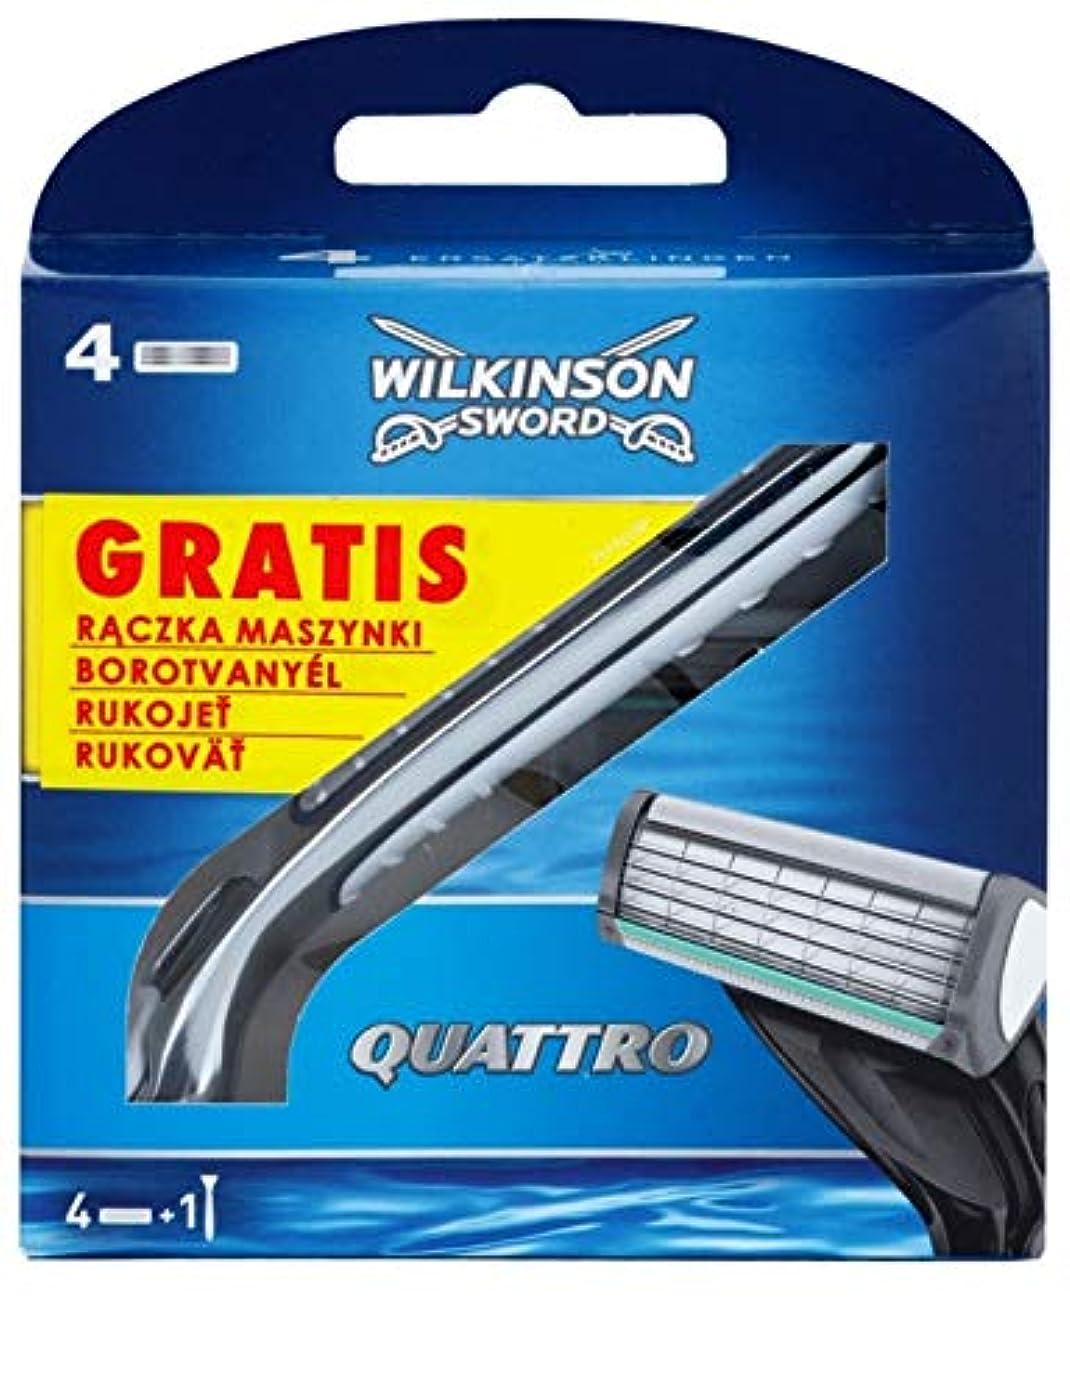 Wilkinson Sword Quattro ウィルキンソンソード クアトロ 4 +1 [並行輸入品]